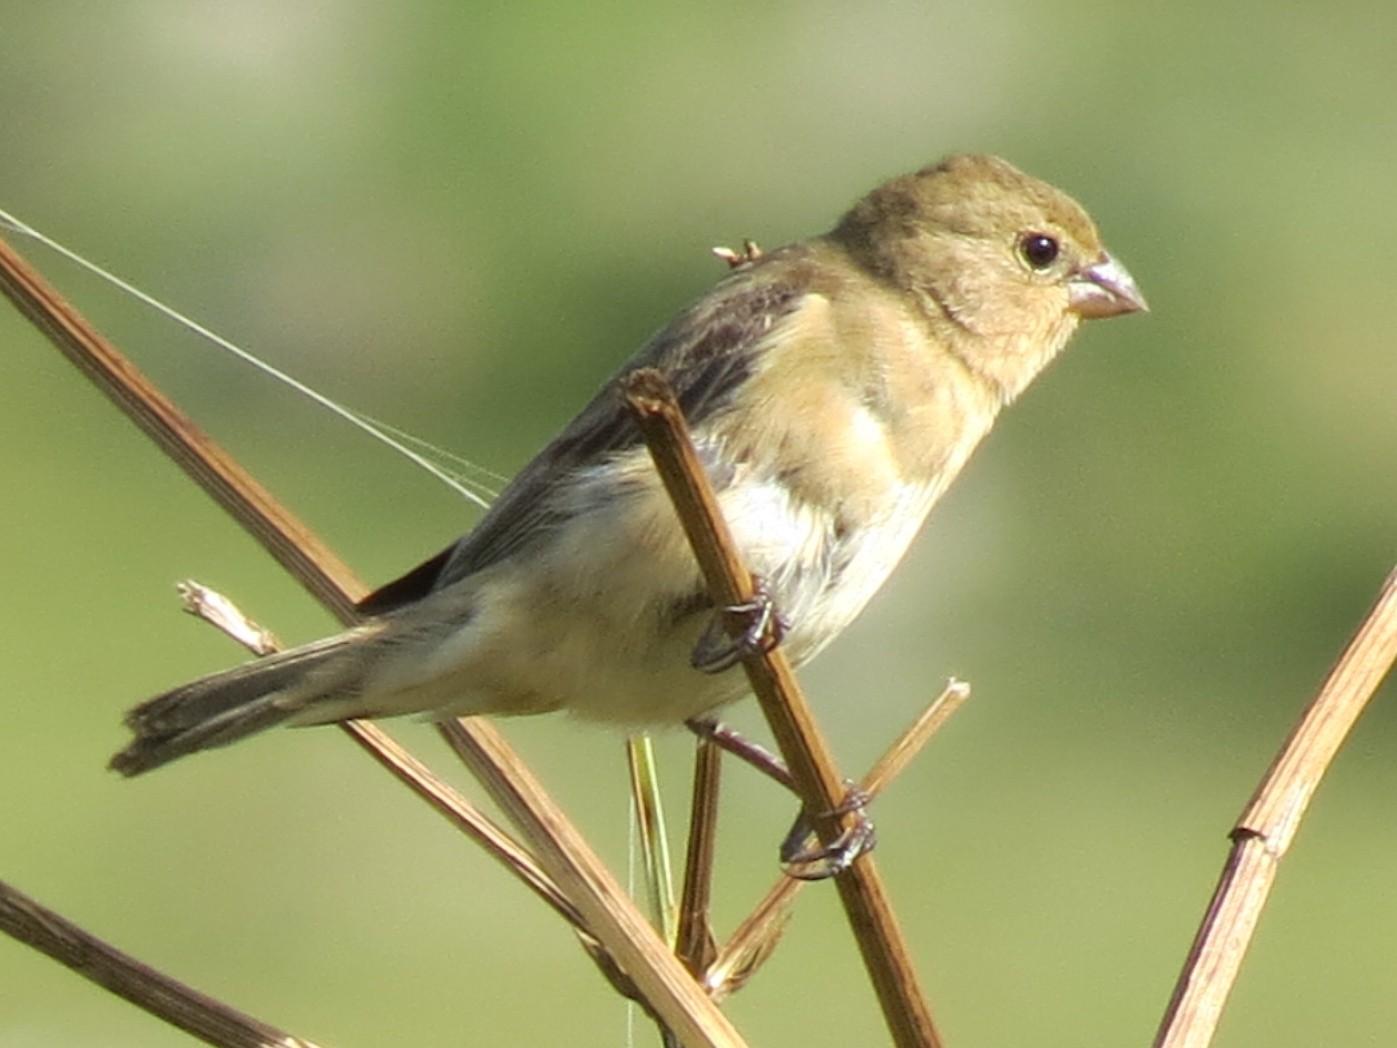 Rufous-rumped Seedeater - Àlvaro Riccetto